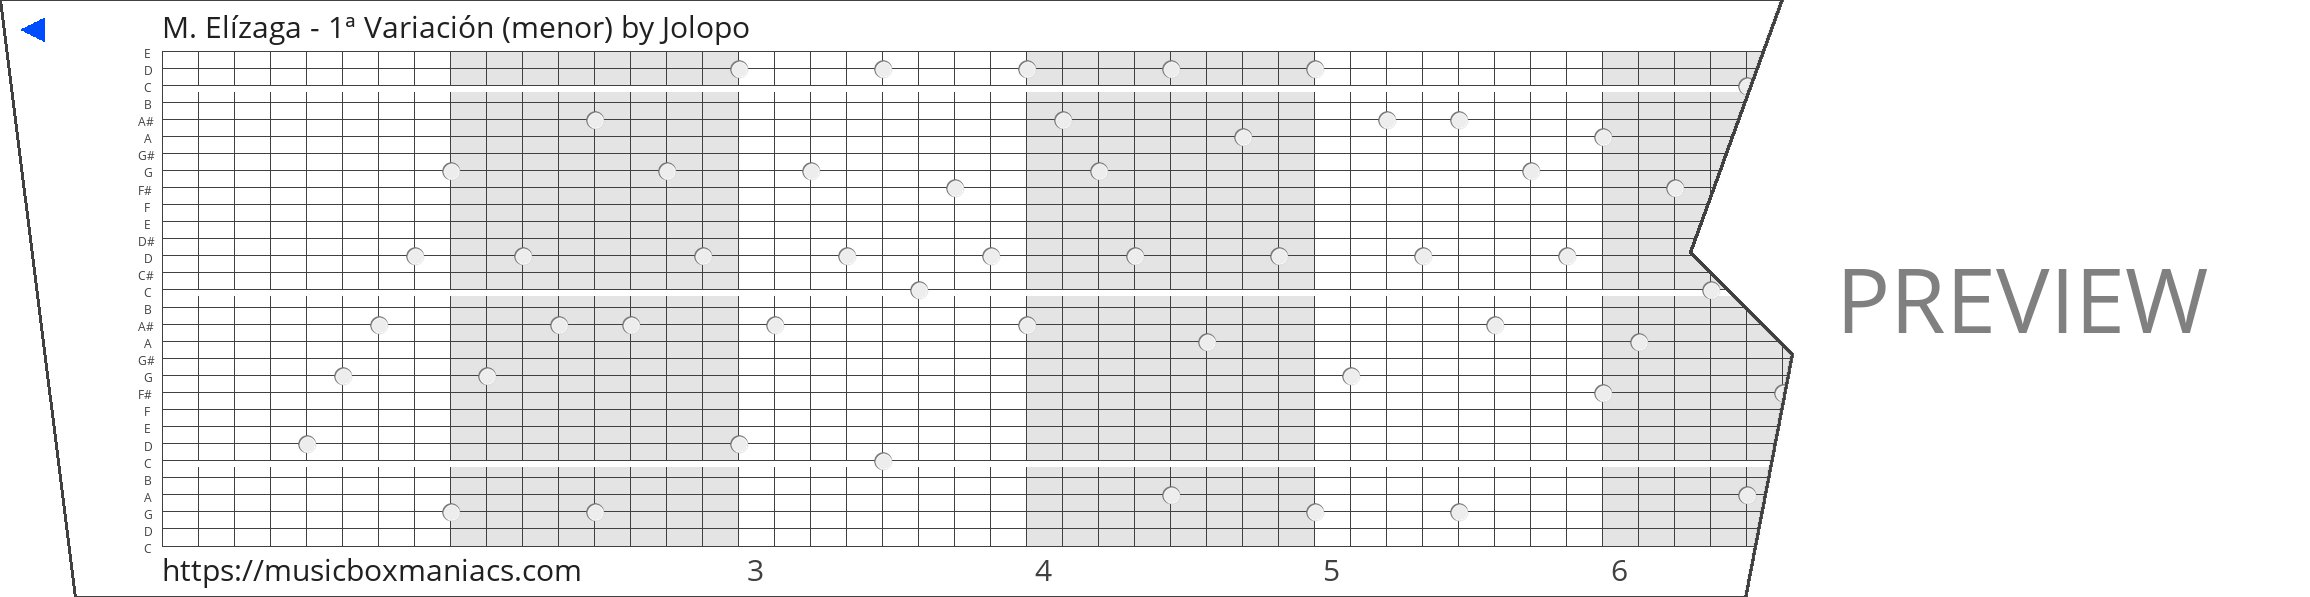 M. Elízaga - 1ª Variación (menor) 30 note music box paper strip